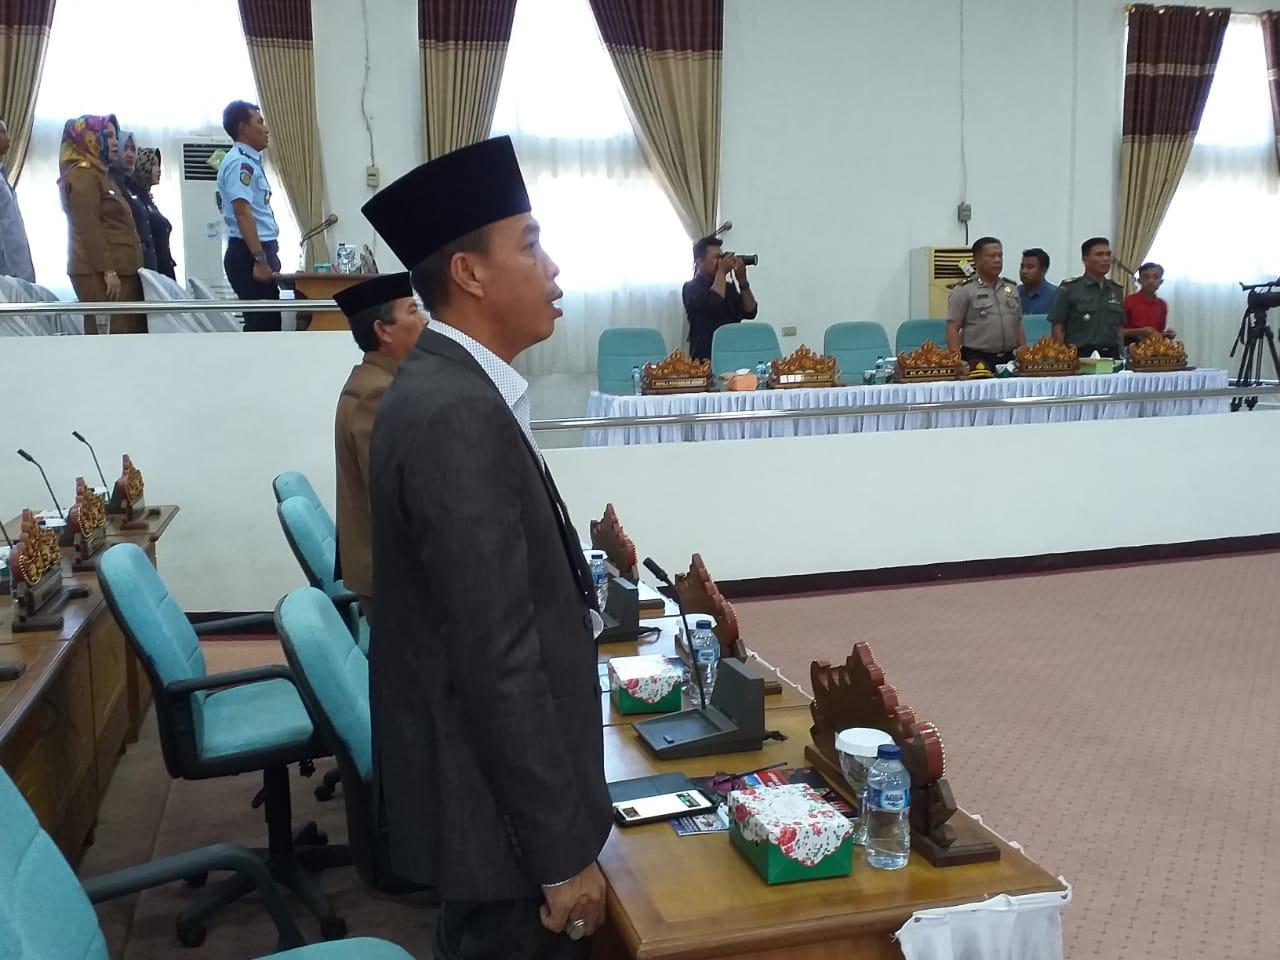 DPRD Lampung Tengah Bentuk Pansus LKPJ 2018